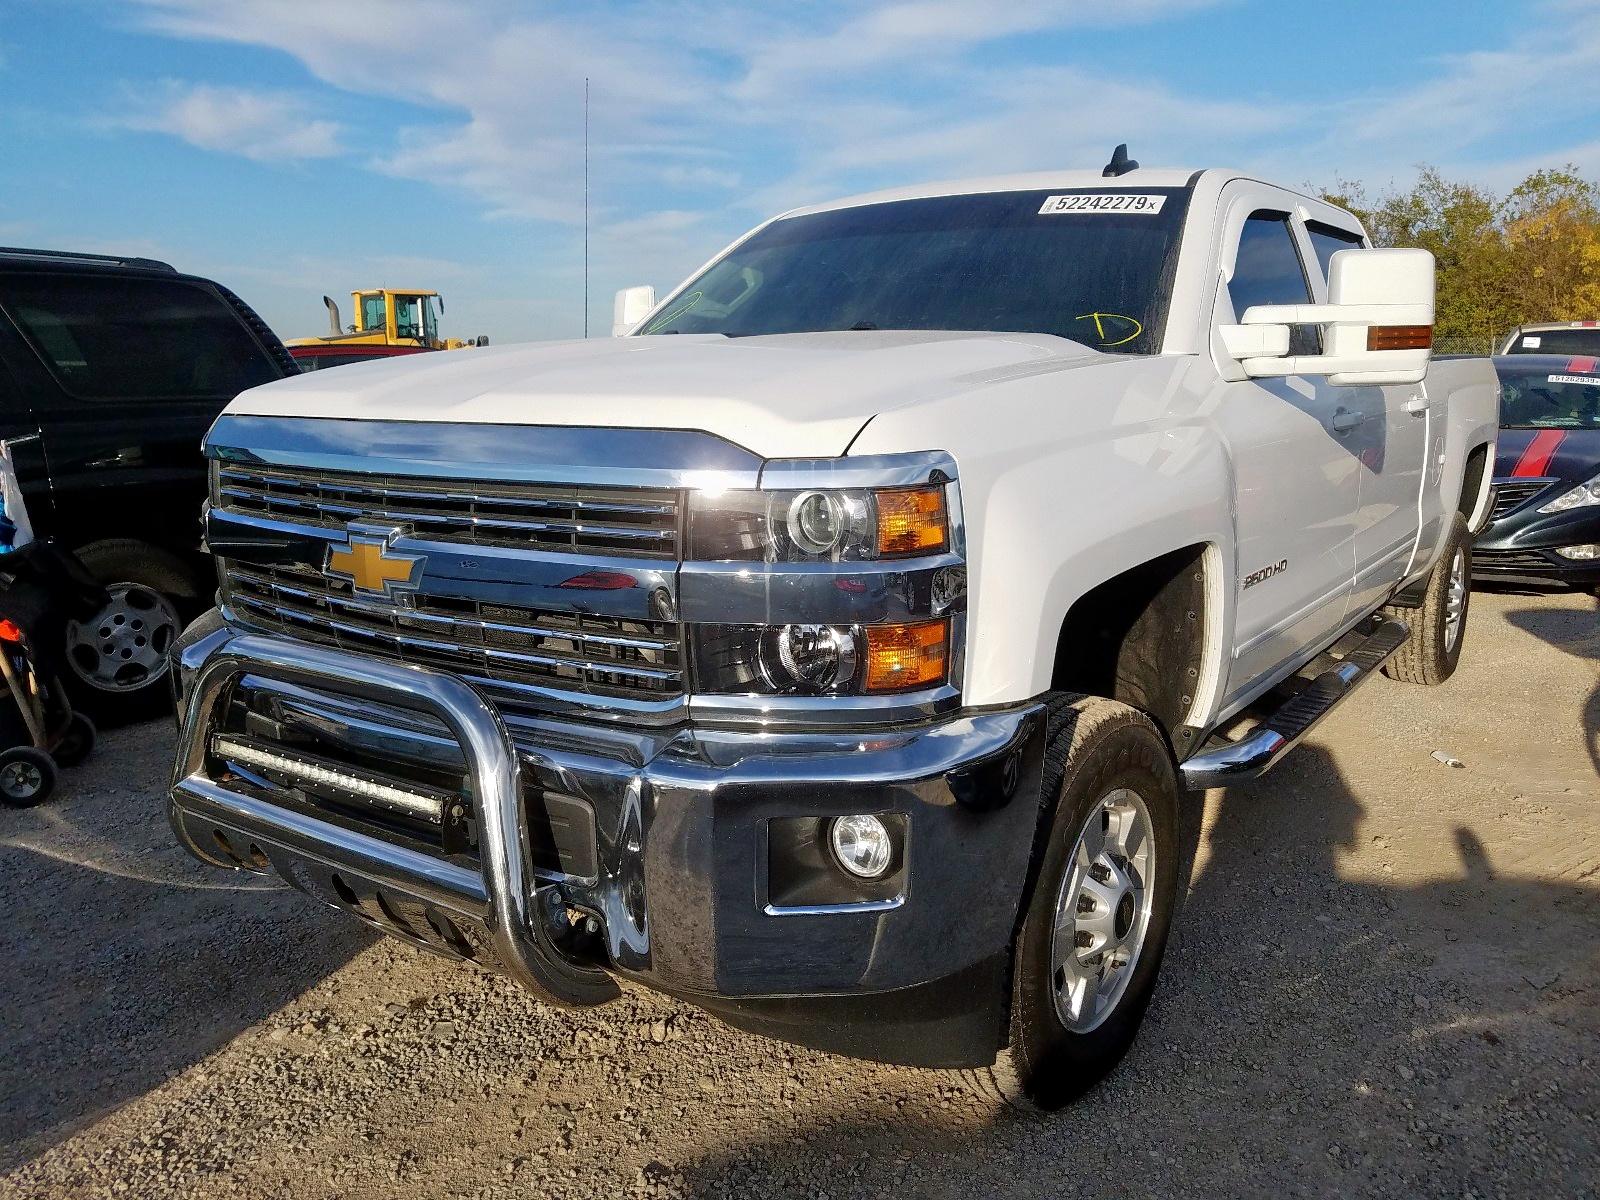 1GC1CVEG1GF279626 - 2016 Chevrolet Silverado 6.0L Right View